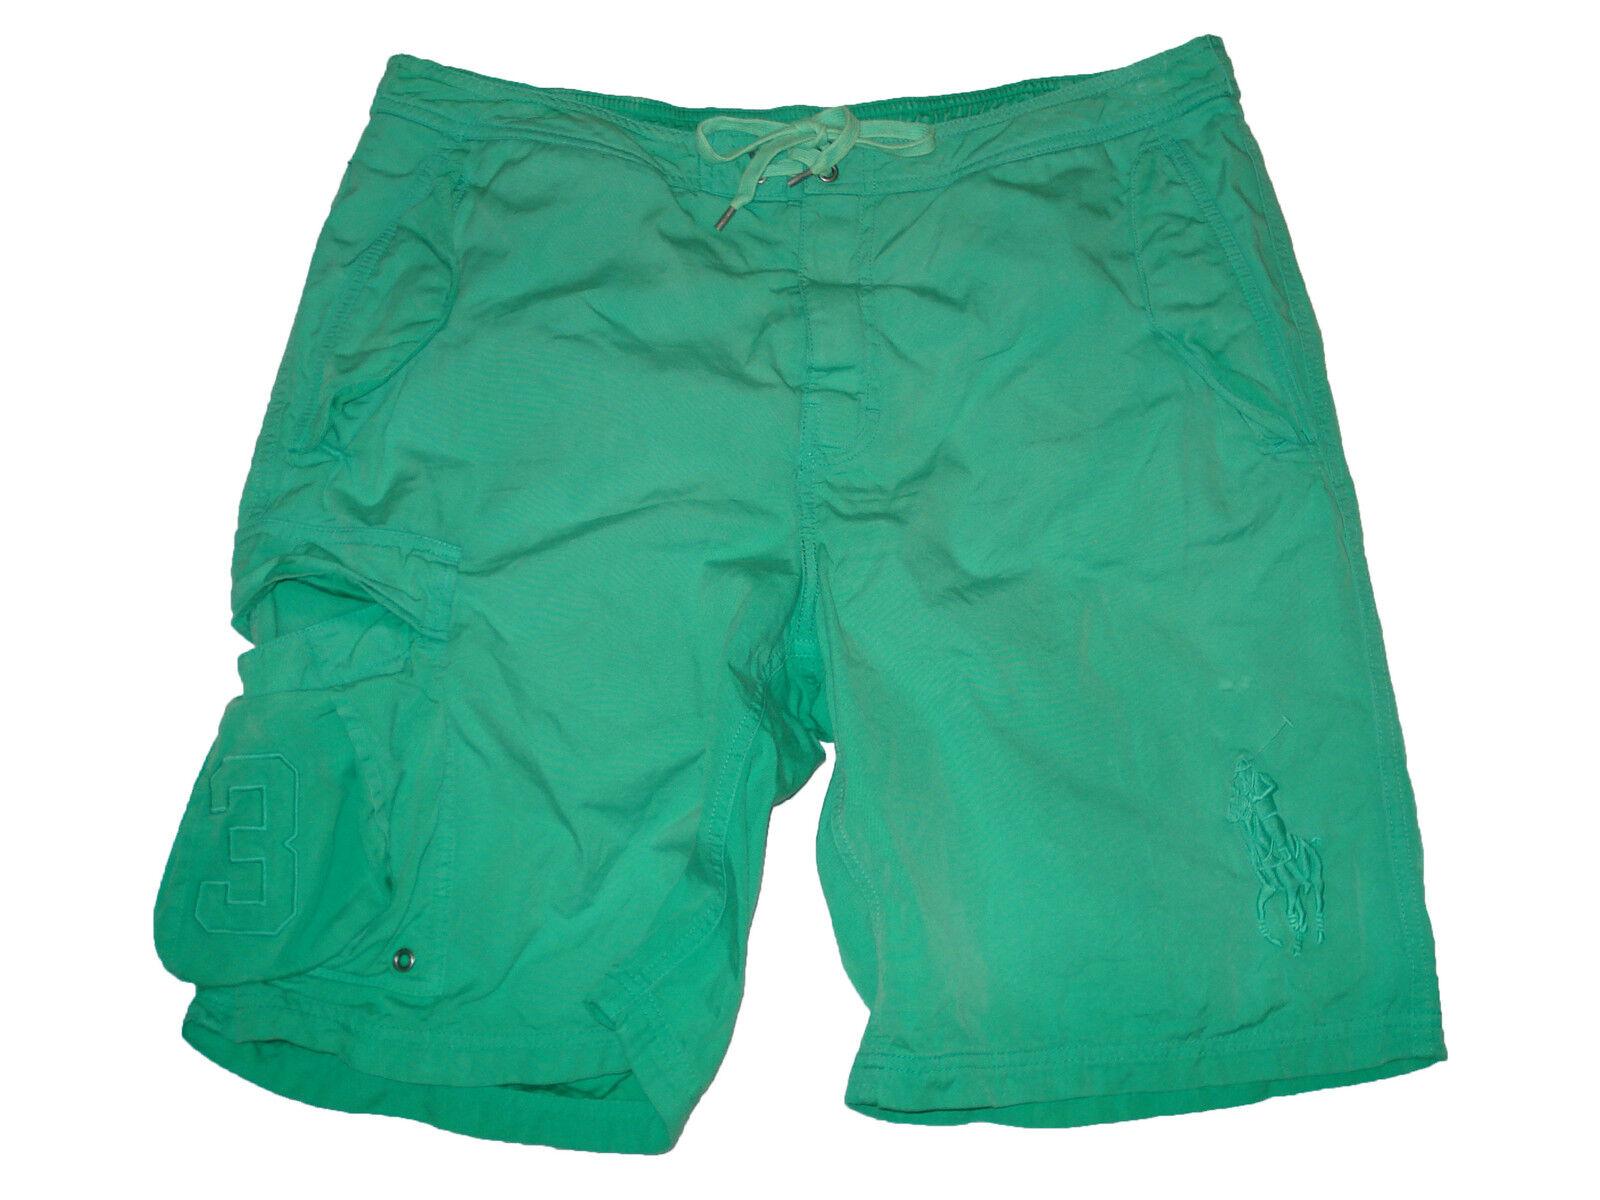 Polo Ralph Lauren Big Pony Palm Green Board Swim Surf Shorts Suit L